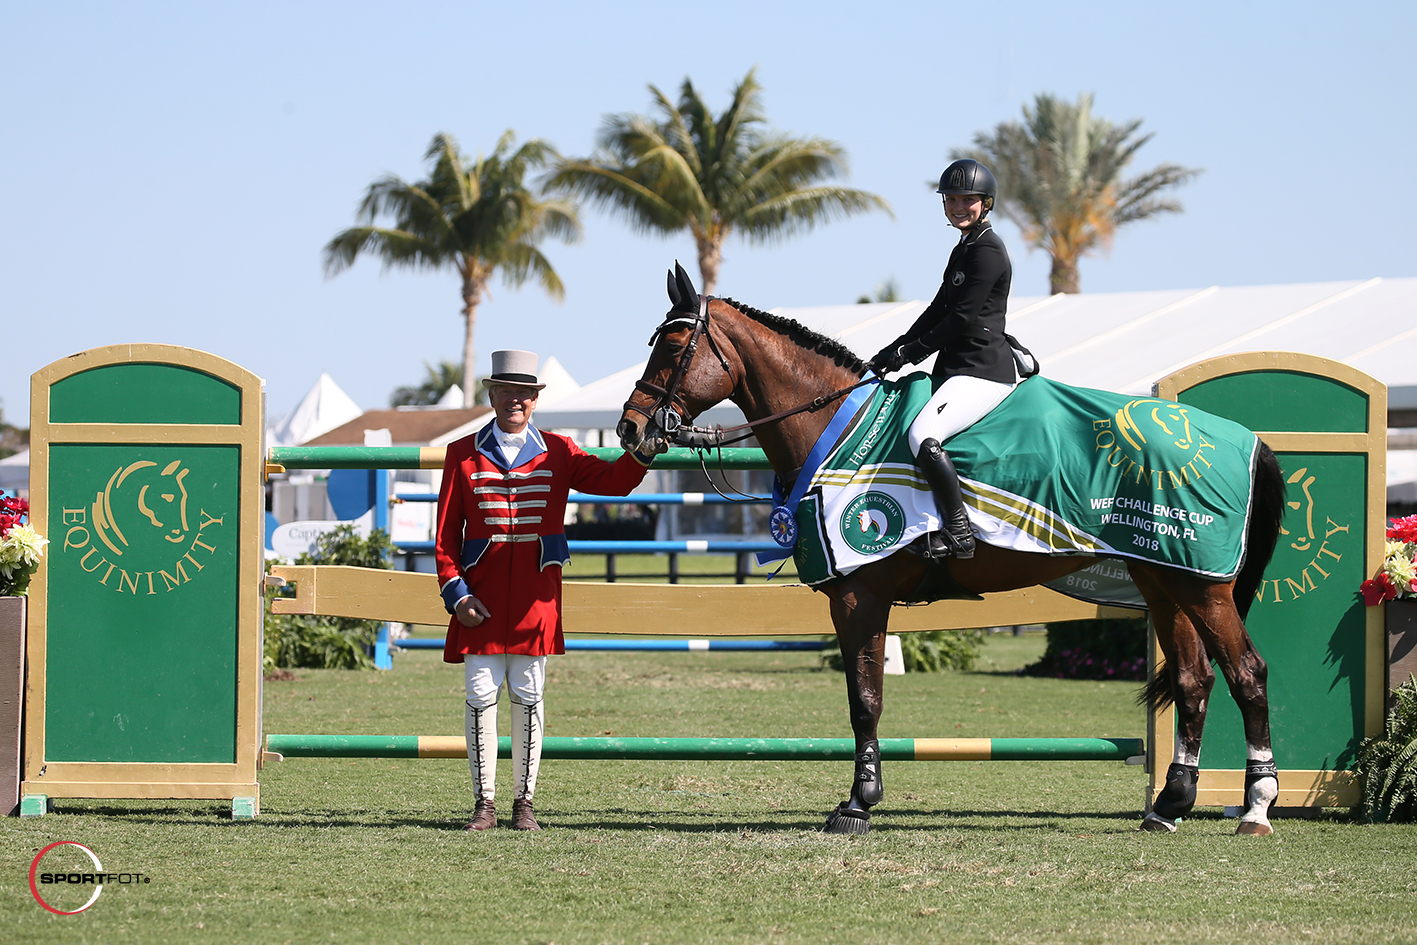 Emily Moffitt and Tipsy du Terral pres 325_1101 Sportfot